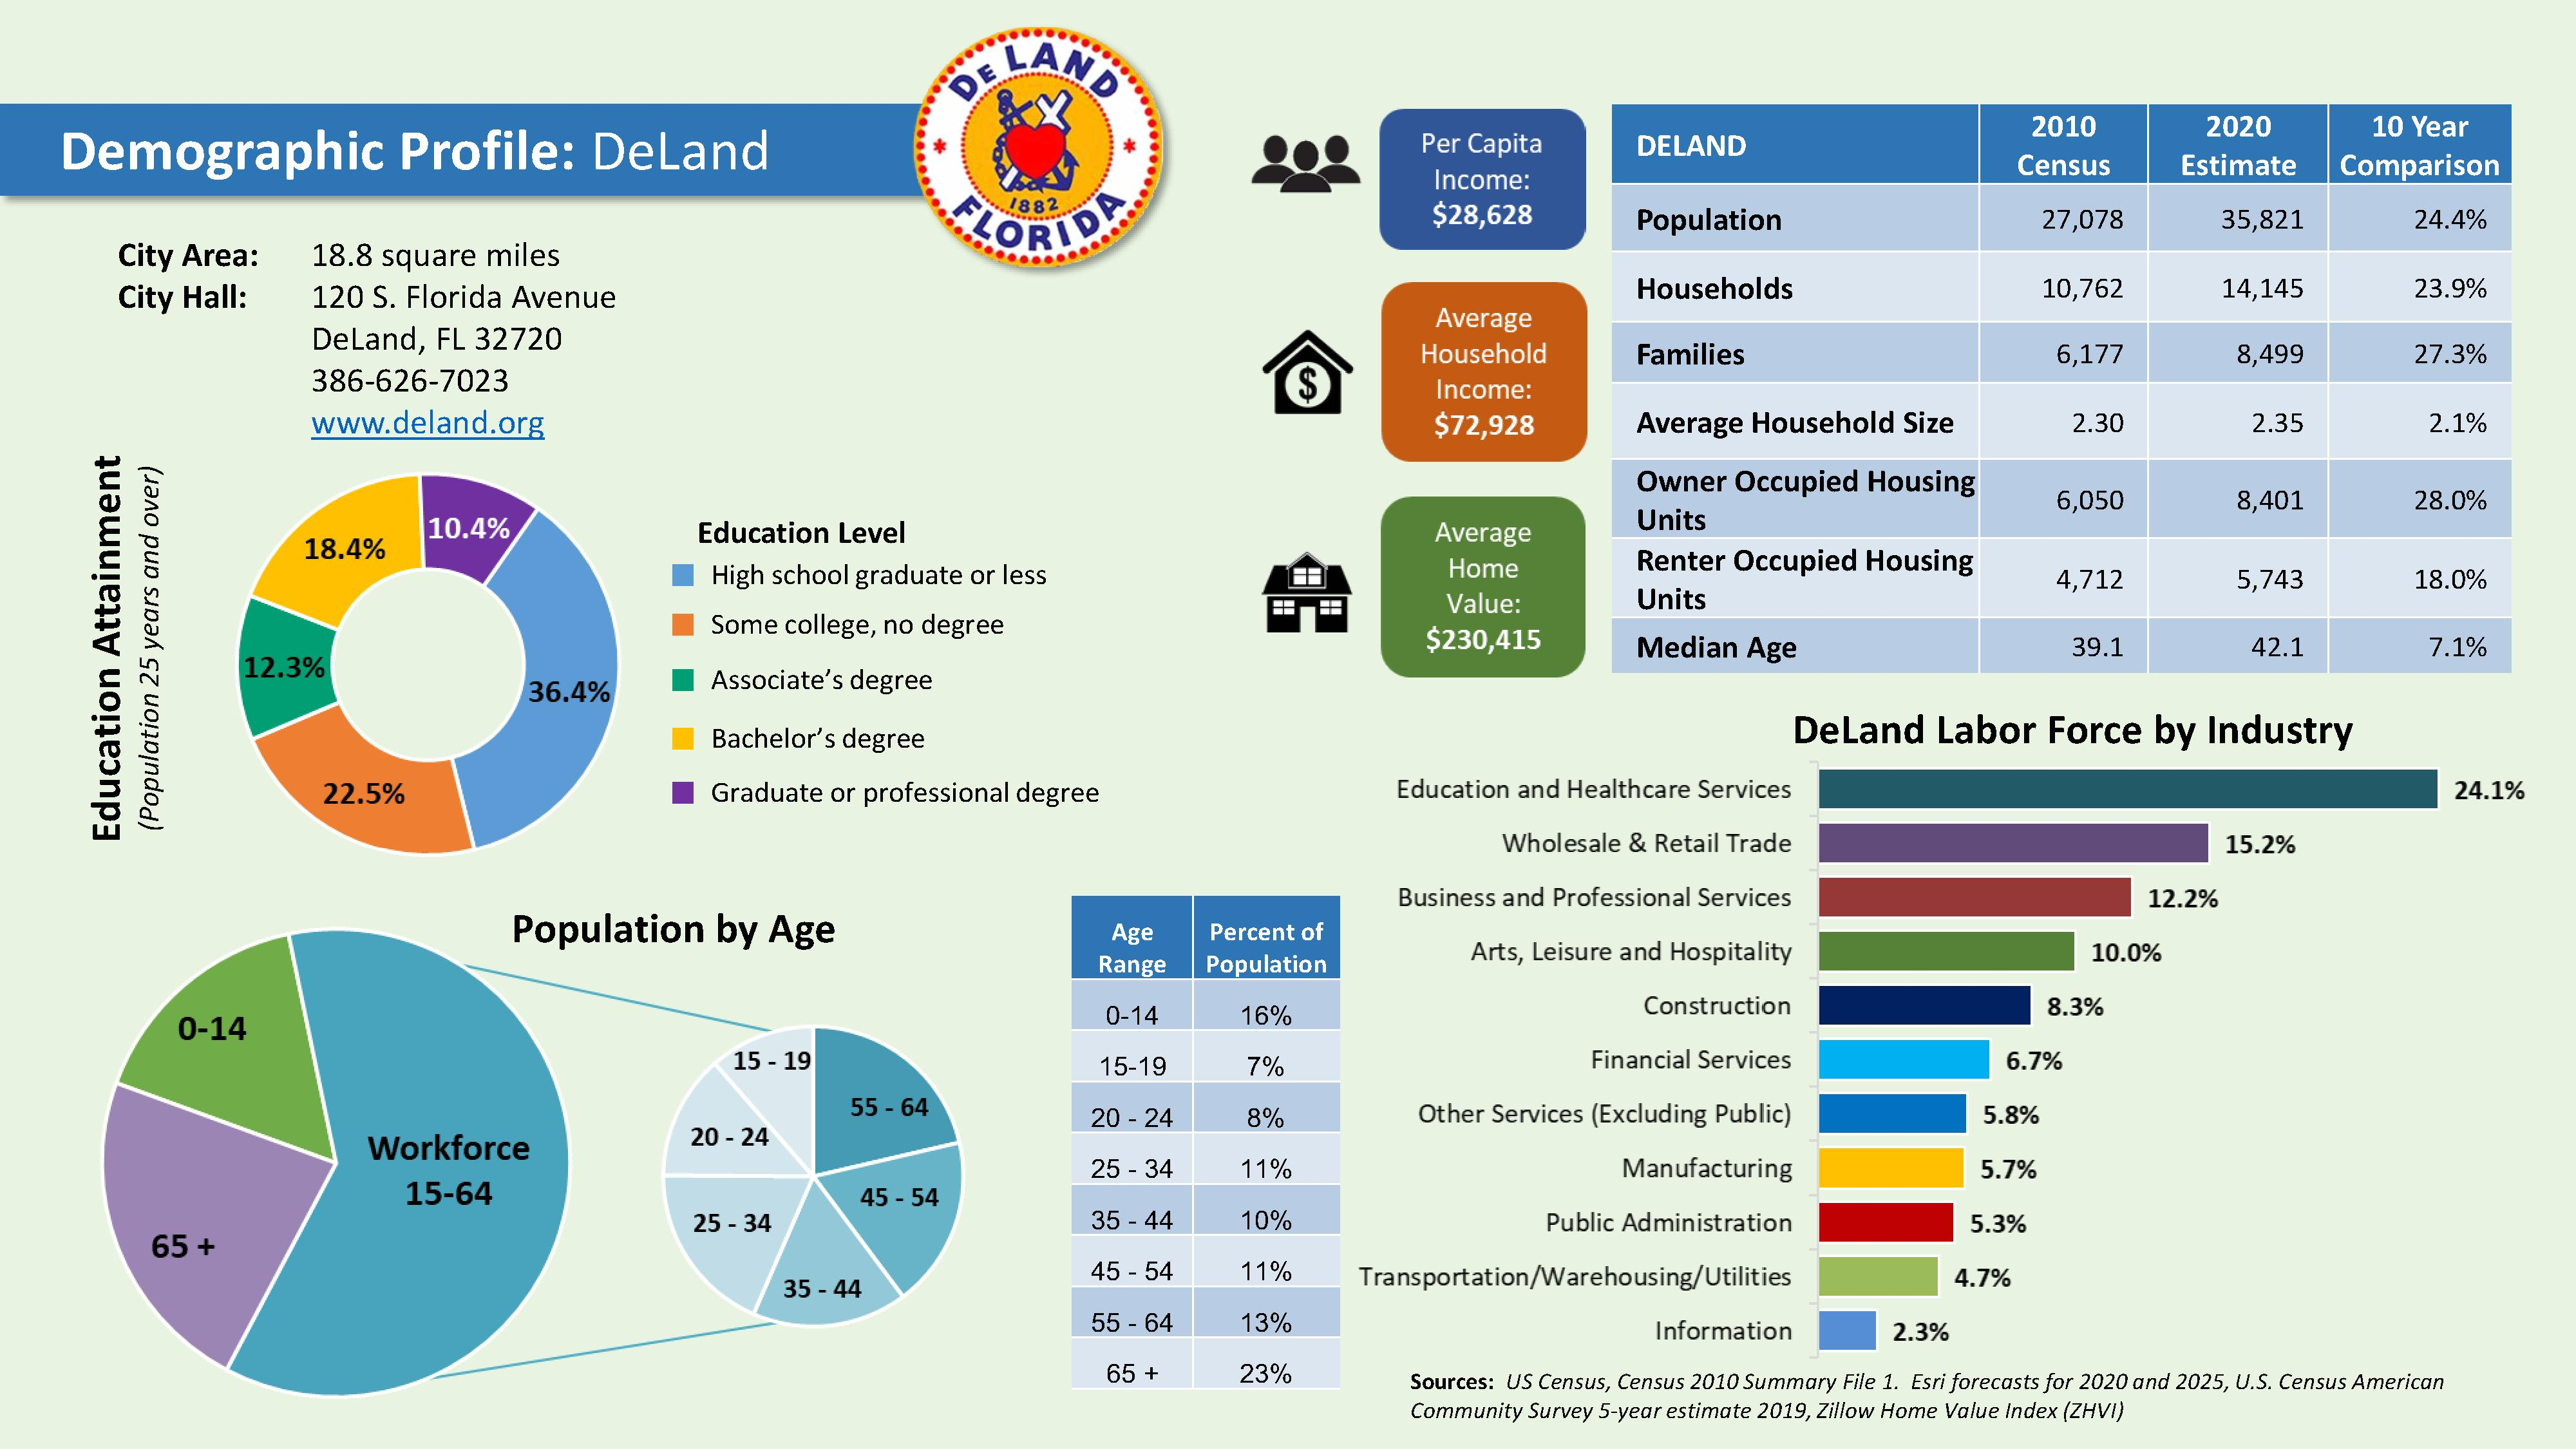 2020 DeLand Demographic Profile